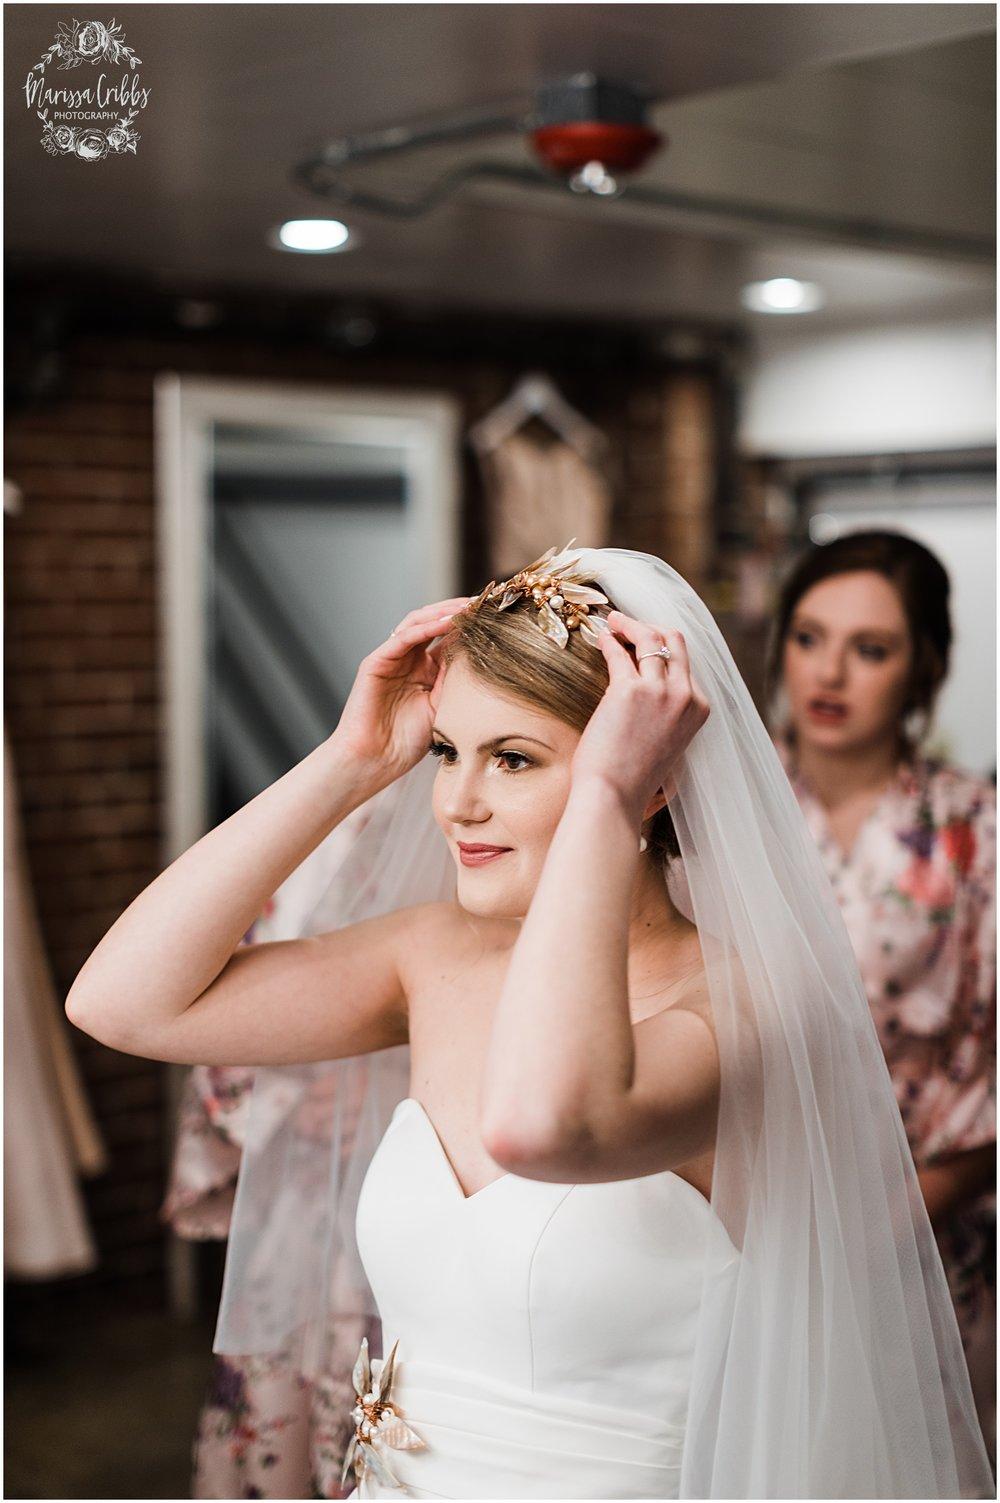 ABBY & CHARLIE WEDDING   THE HUDSON EVENT SPACE WEDDING   MARISSA CRIBBS PHOTOGRAPHY_7504.jpg